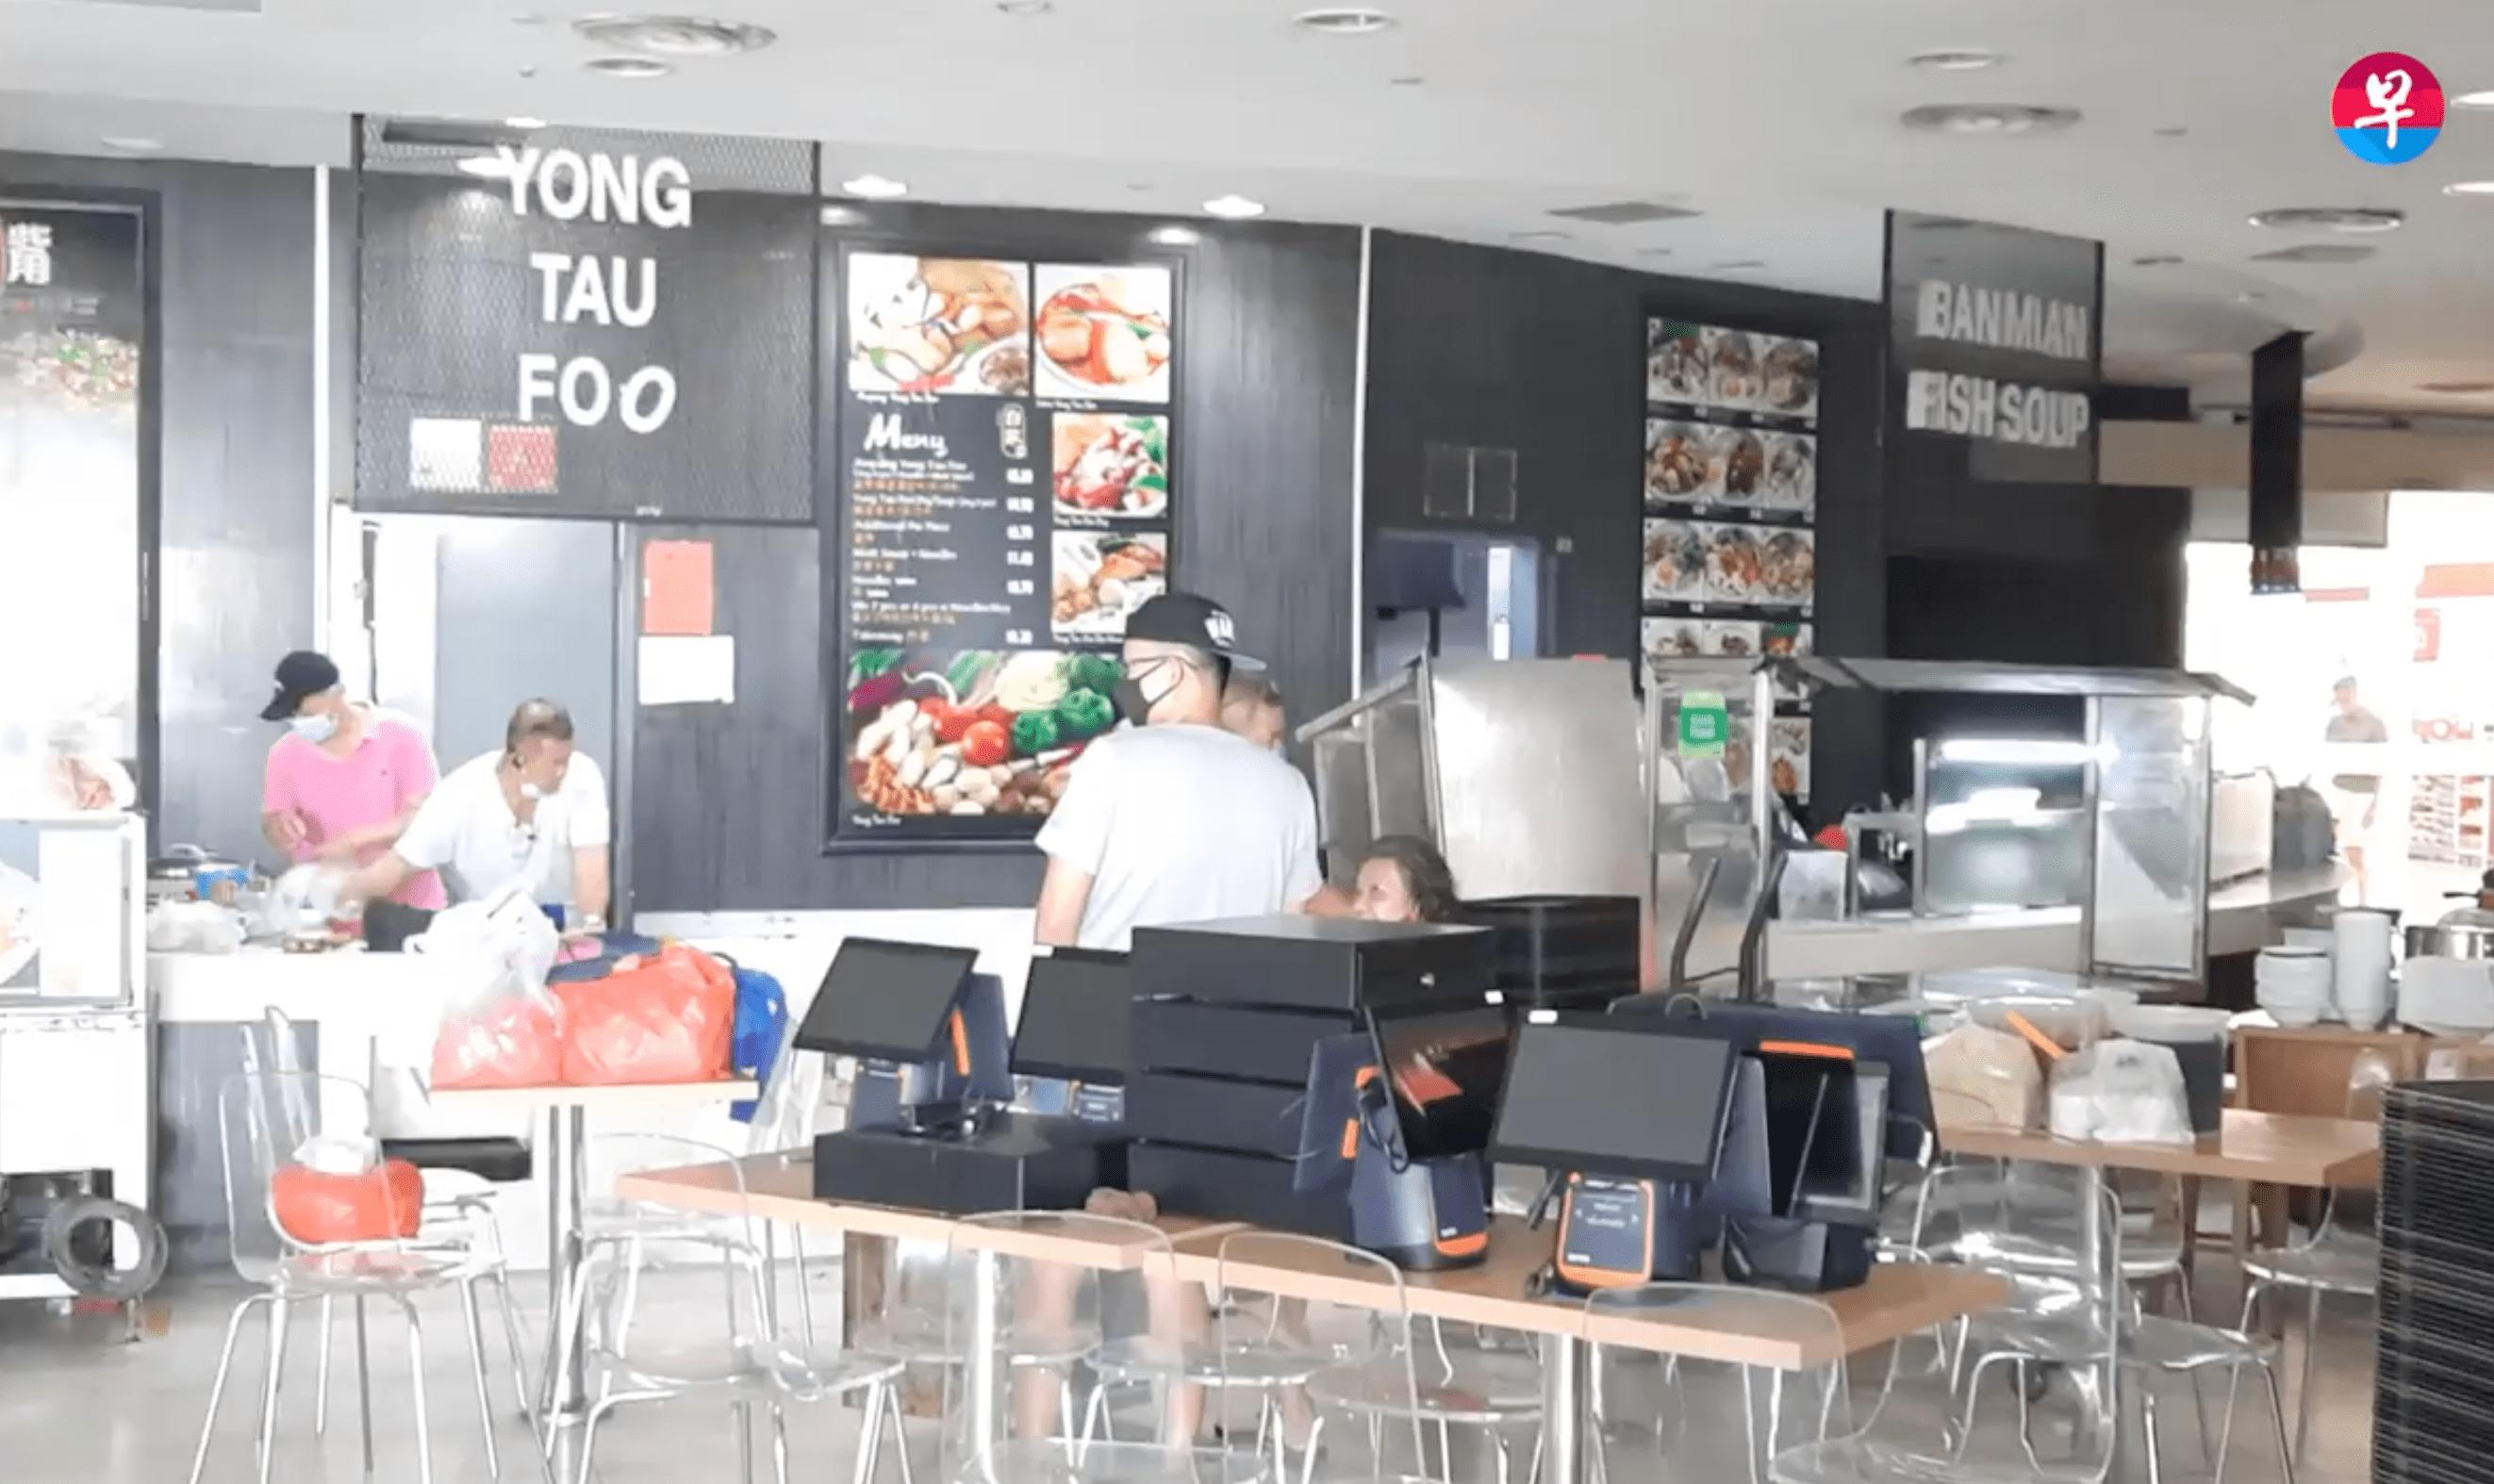 Seletar food court